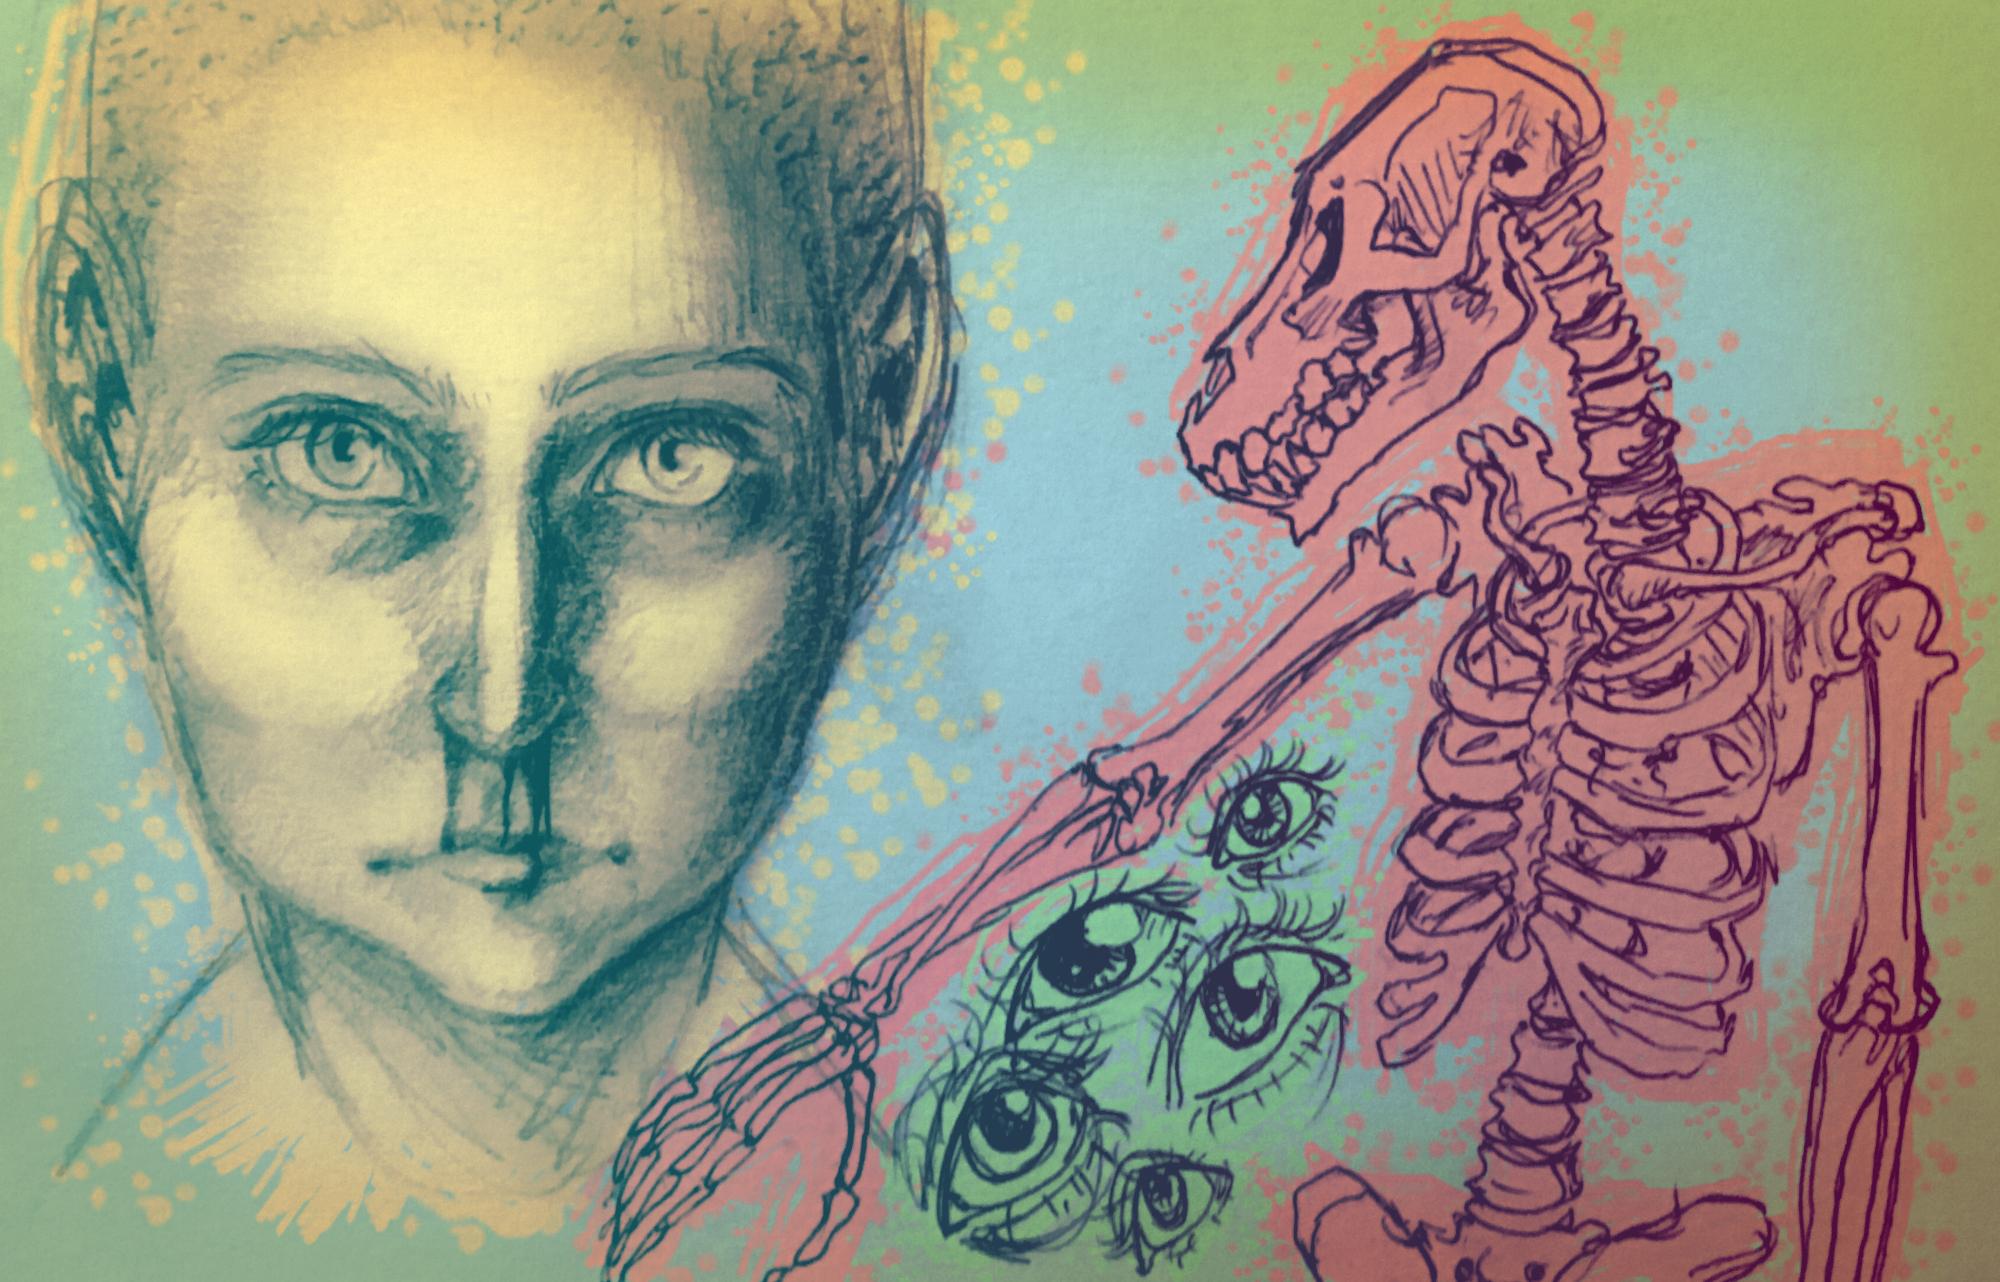 Masterpost: Dermatillomania and Trichotillomania   The Artism Spectrum